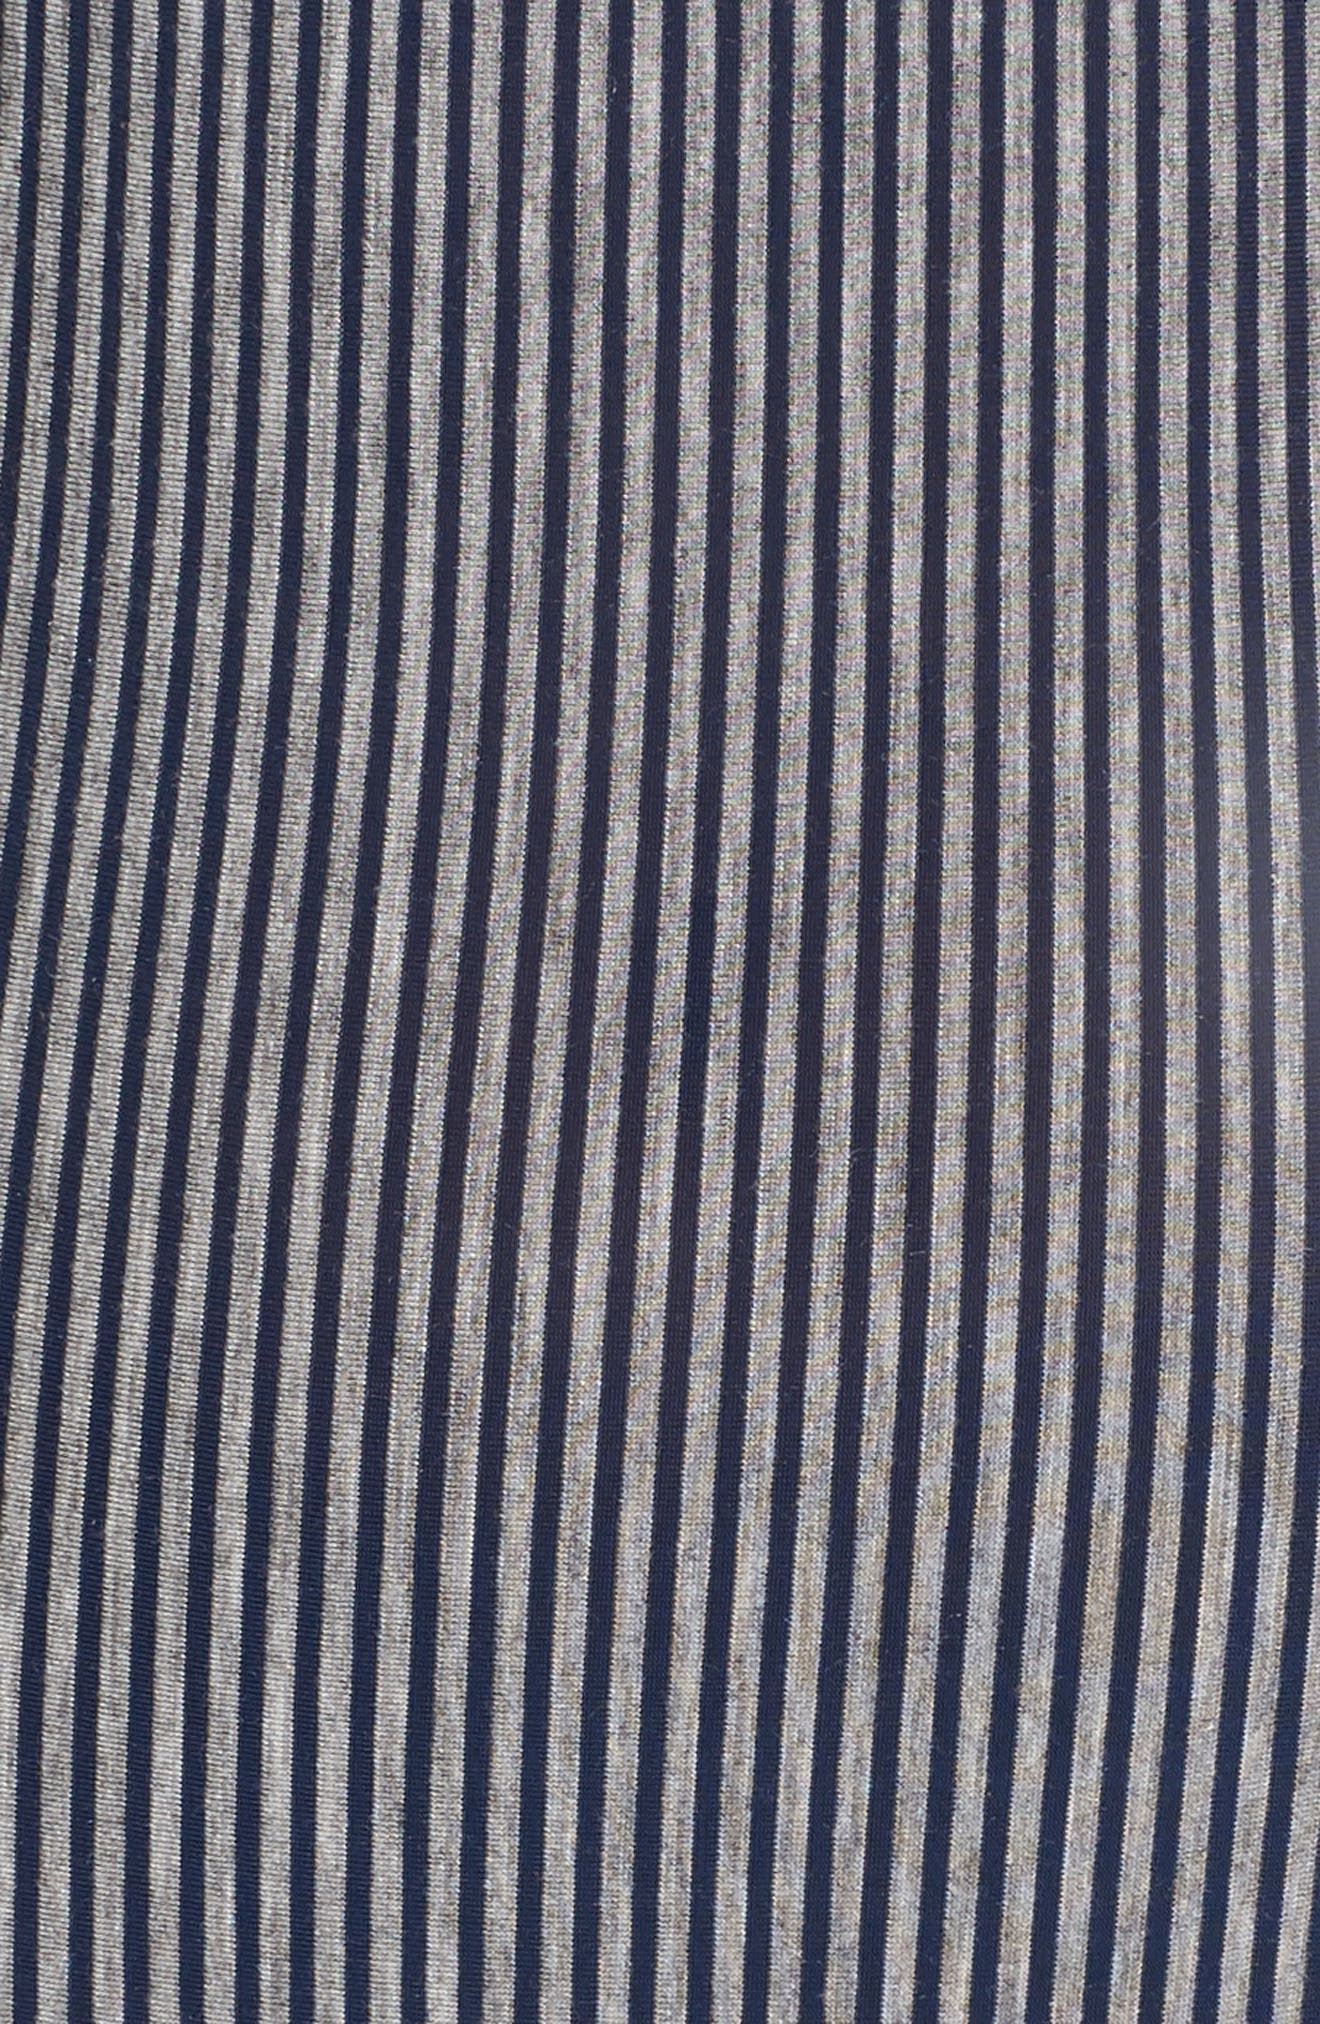 Amalfi Underwire Bodysuit,                             Alternate thumbnail 5, color,                             Heather Grey/ Navy